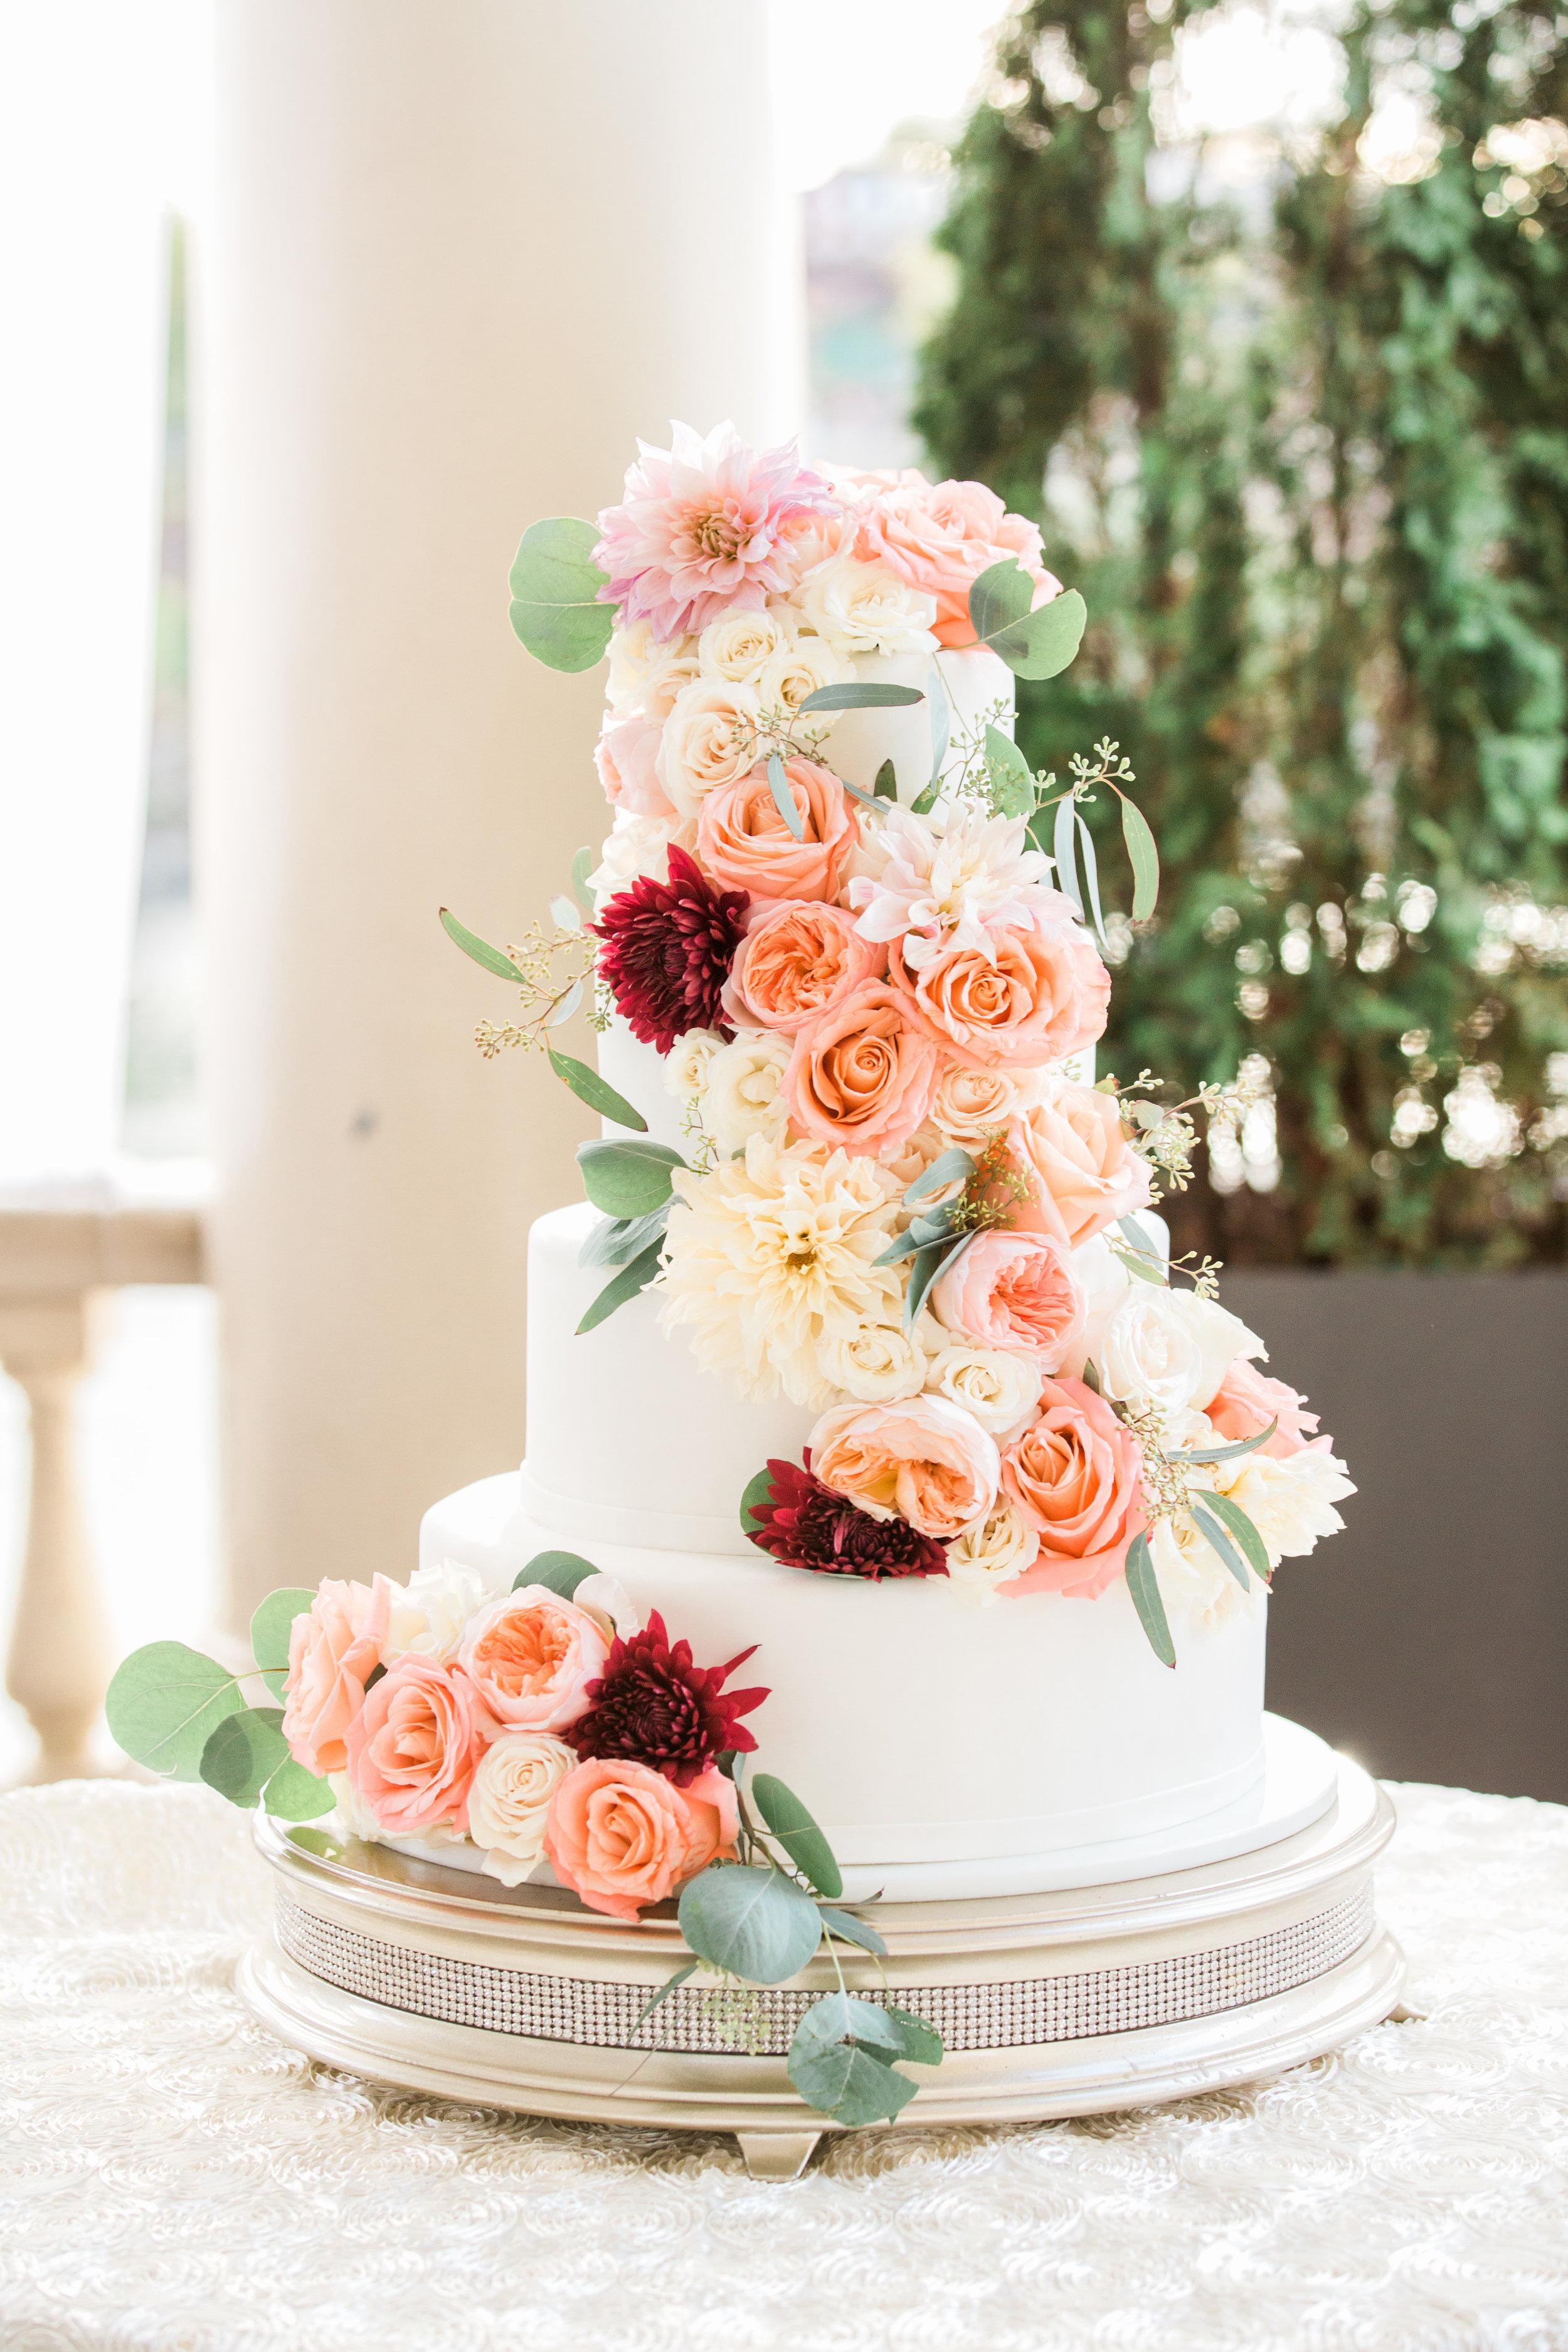 Hudson-Nichols-Black-Tie-Bride-Philadelphia-Waterworks-Wedding-Cescaphe-Floral-Wedding-Cake02.jpg